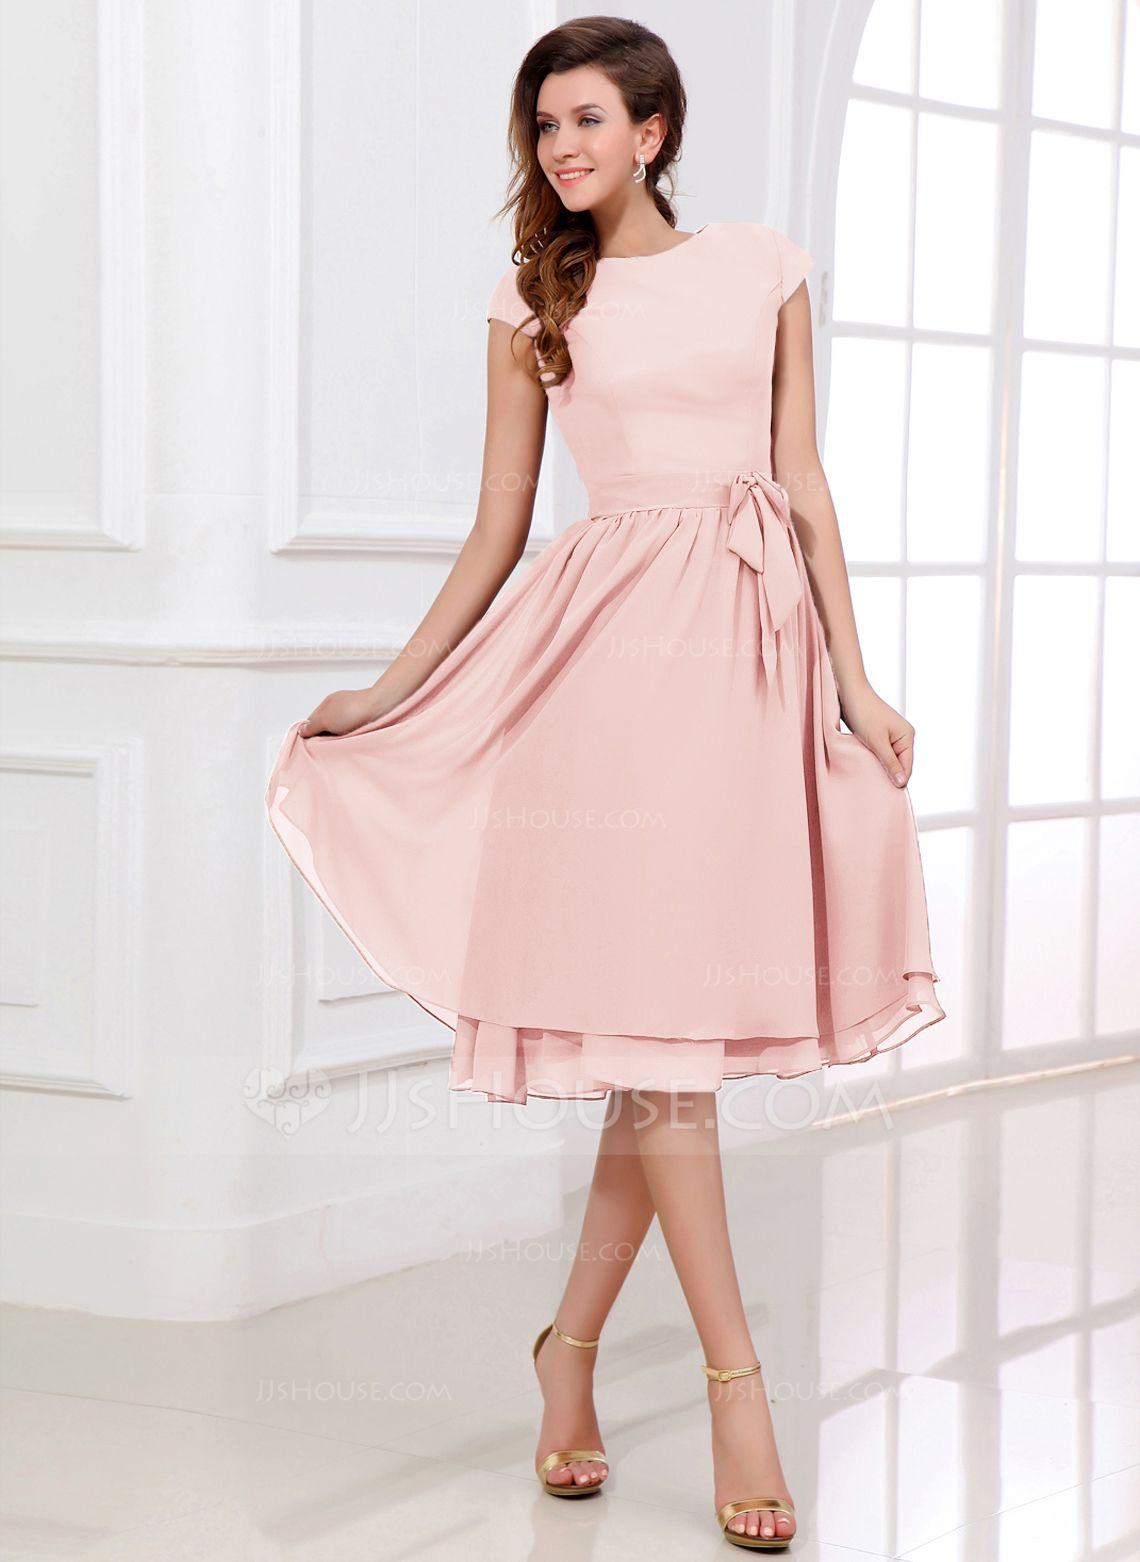 Chiffon Knee-length Bridesmaid Dress with Cap Sleeves And Sashes ...